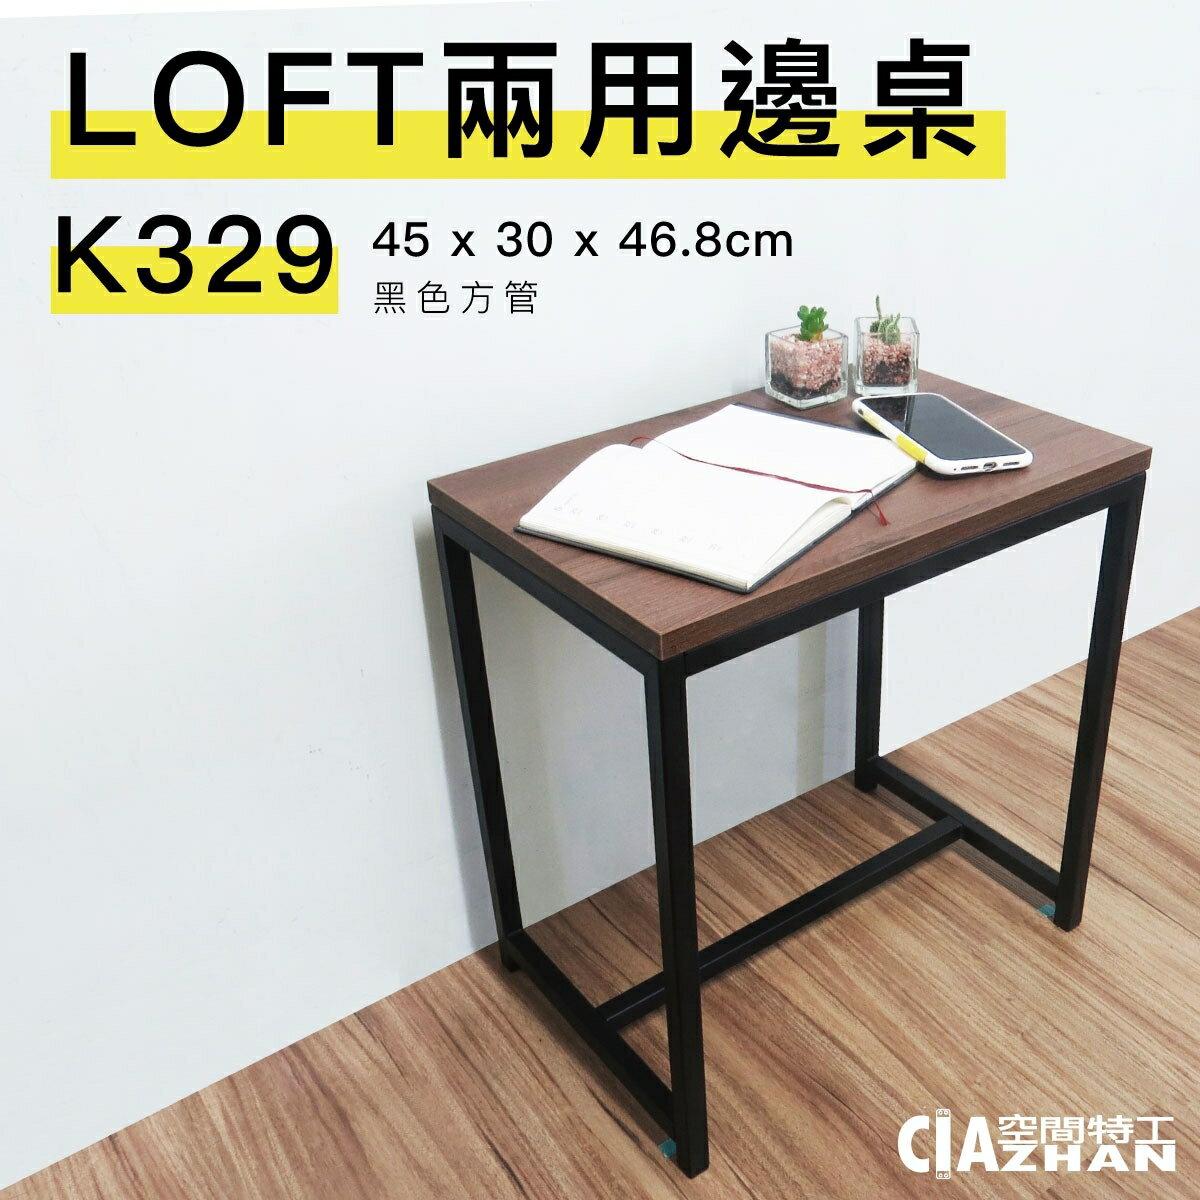 LOFT兩用邊桌(45x30x46.8cm)消光黑 方管椅 茶几 邊桌 工業風 床頭櫃 吧台椅 STB329 空間特工